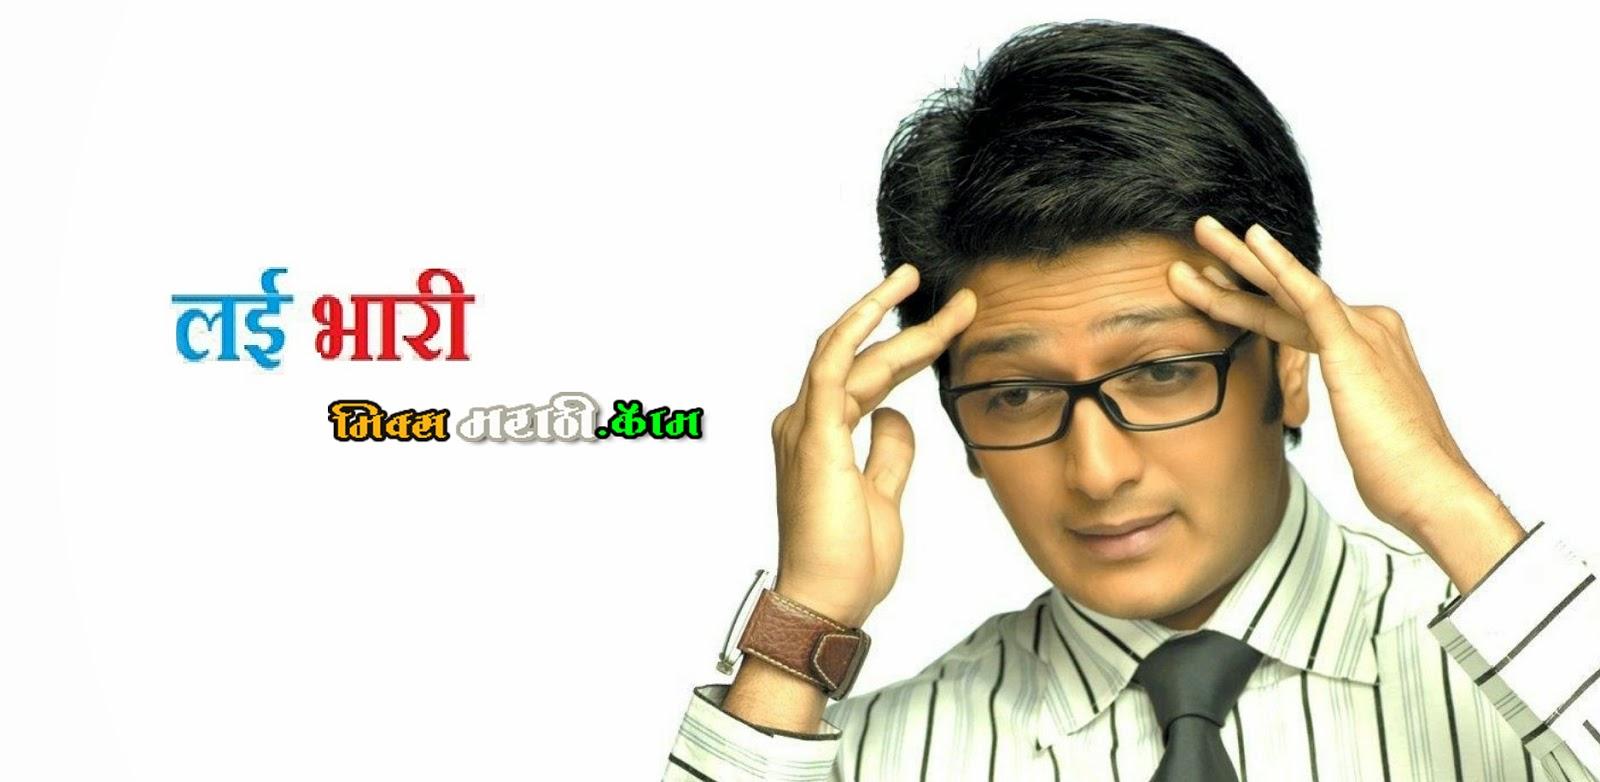 vipmarathi dj song mp3 download